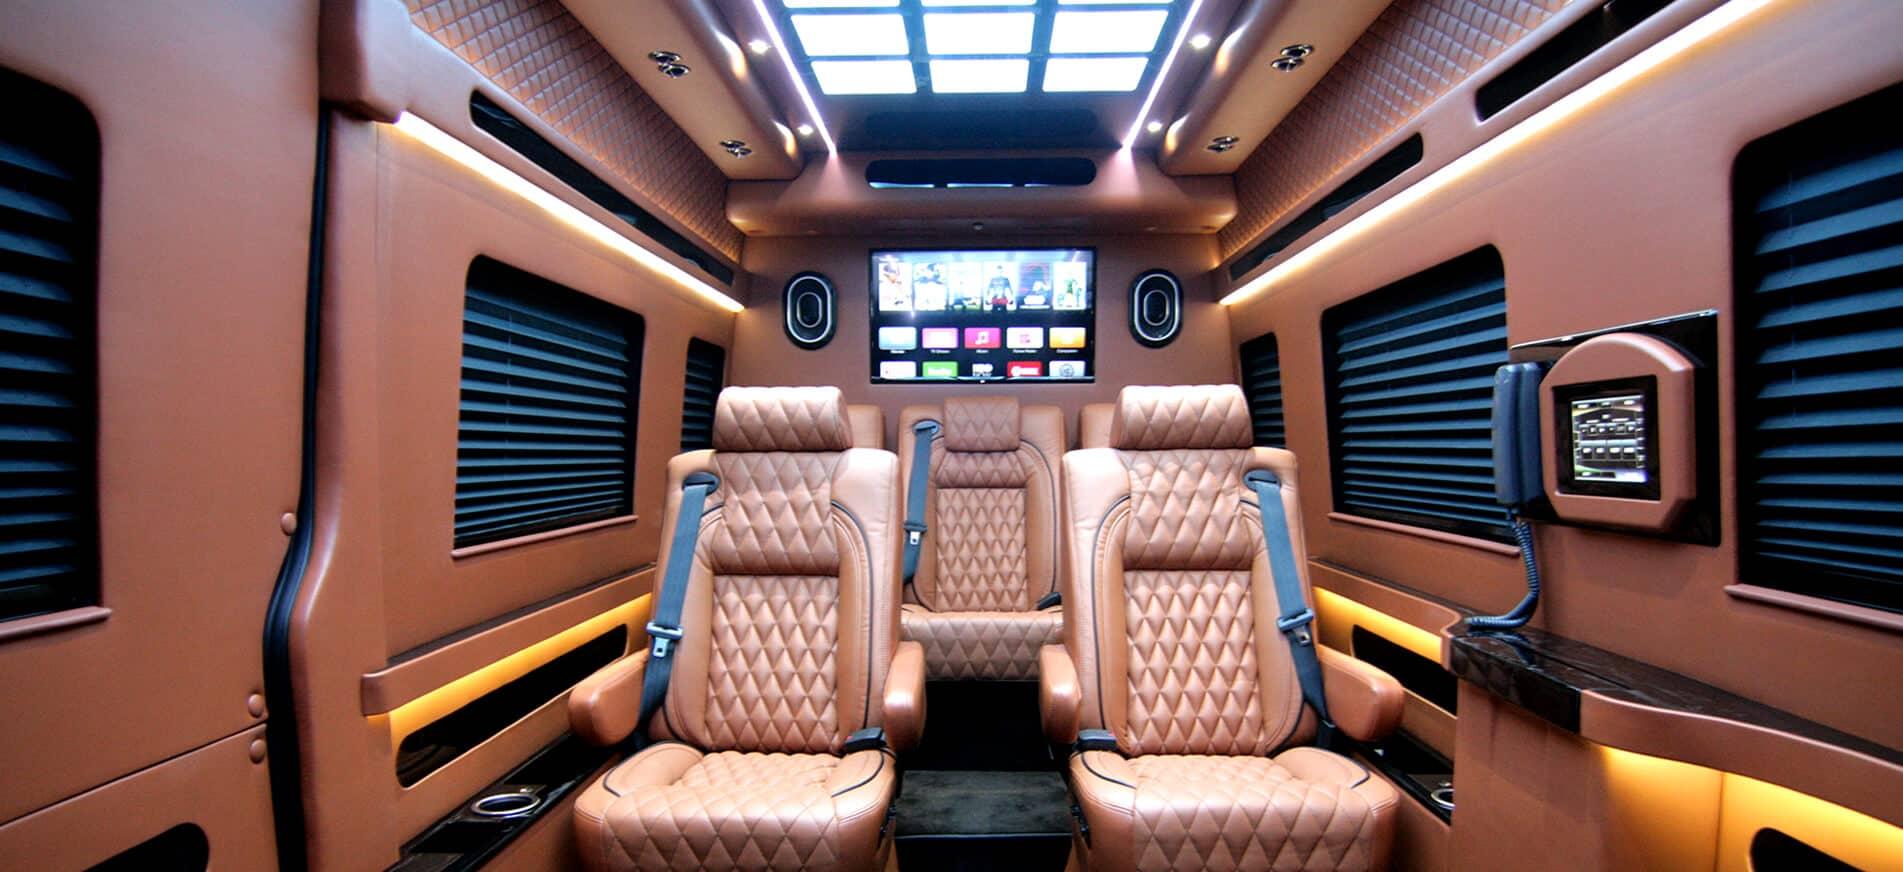 Mercedes Rv For Sale >> Custom Conversion Vans, Sprinters and SUVs | HQ Custom Design